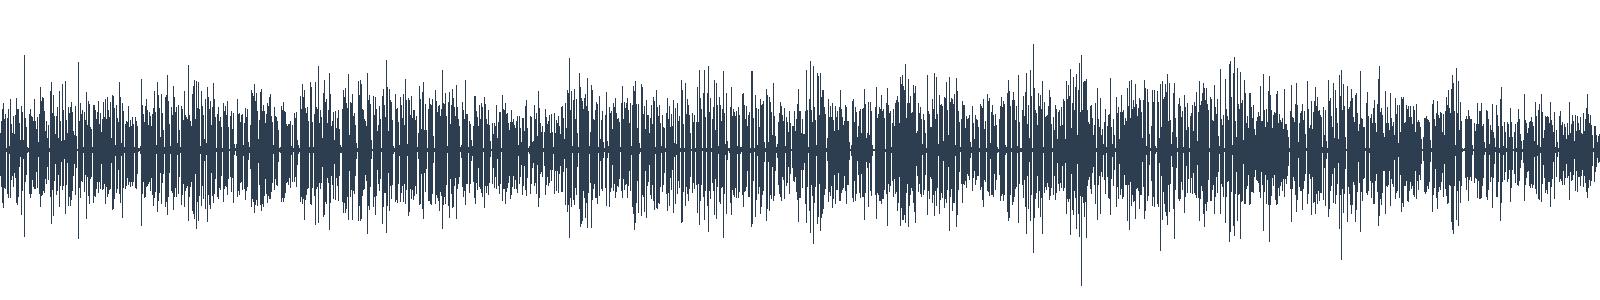 Lurdské uzdravenia  waveform